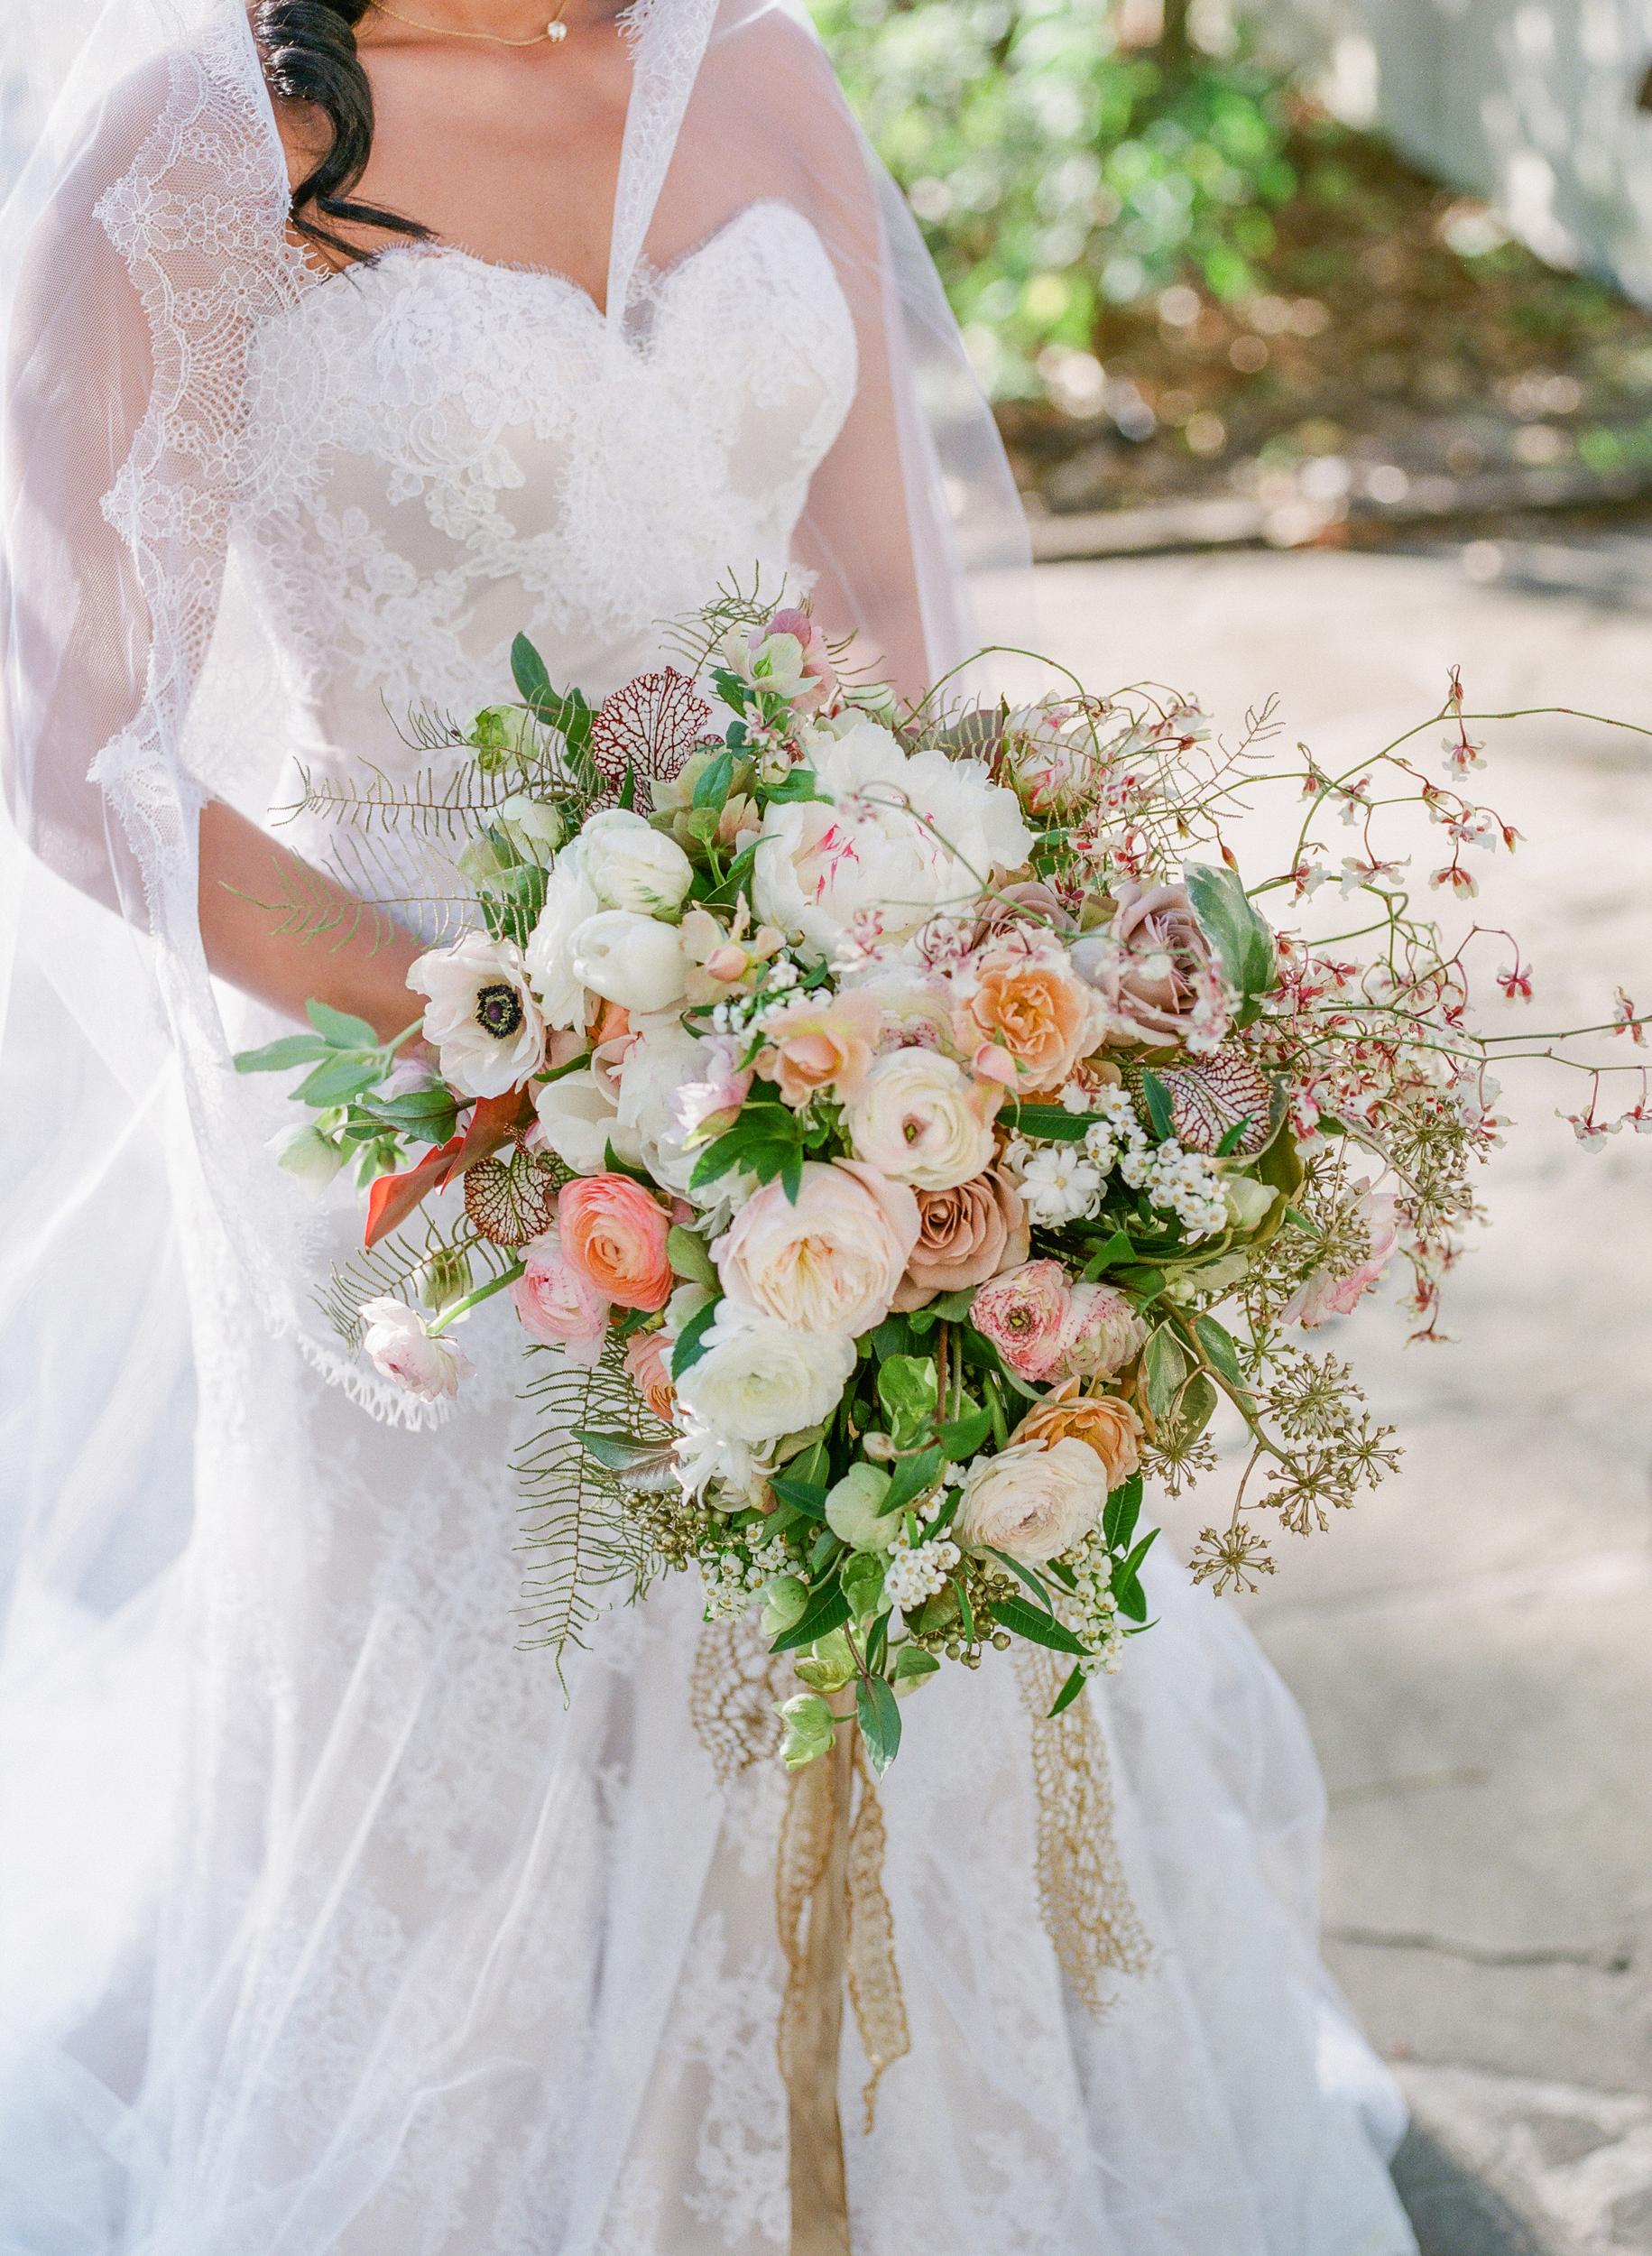 suzanne joseph wedding bouquet corbin gurkin